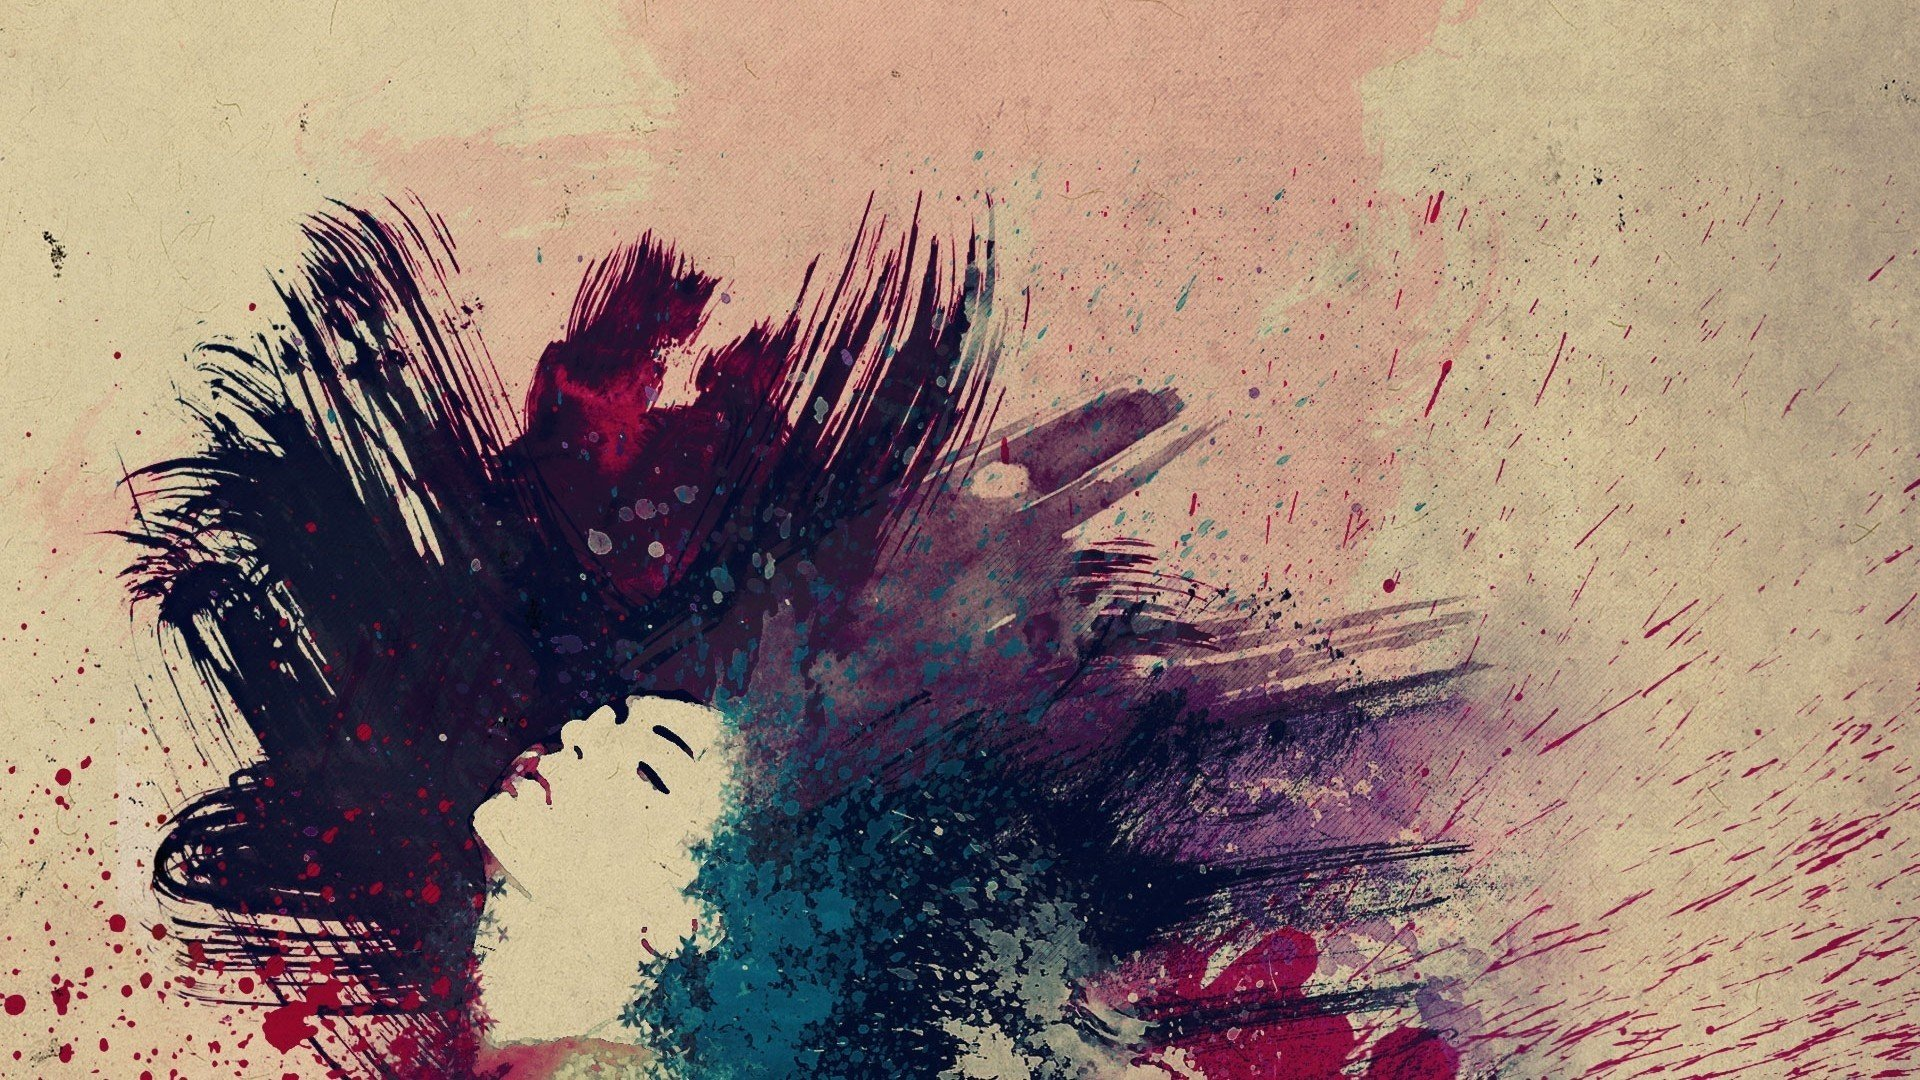 Brush wallpaper image hd